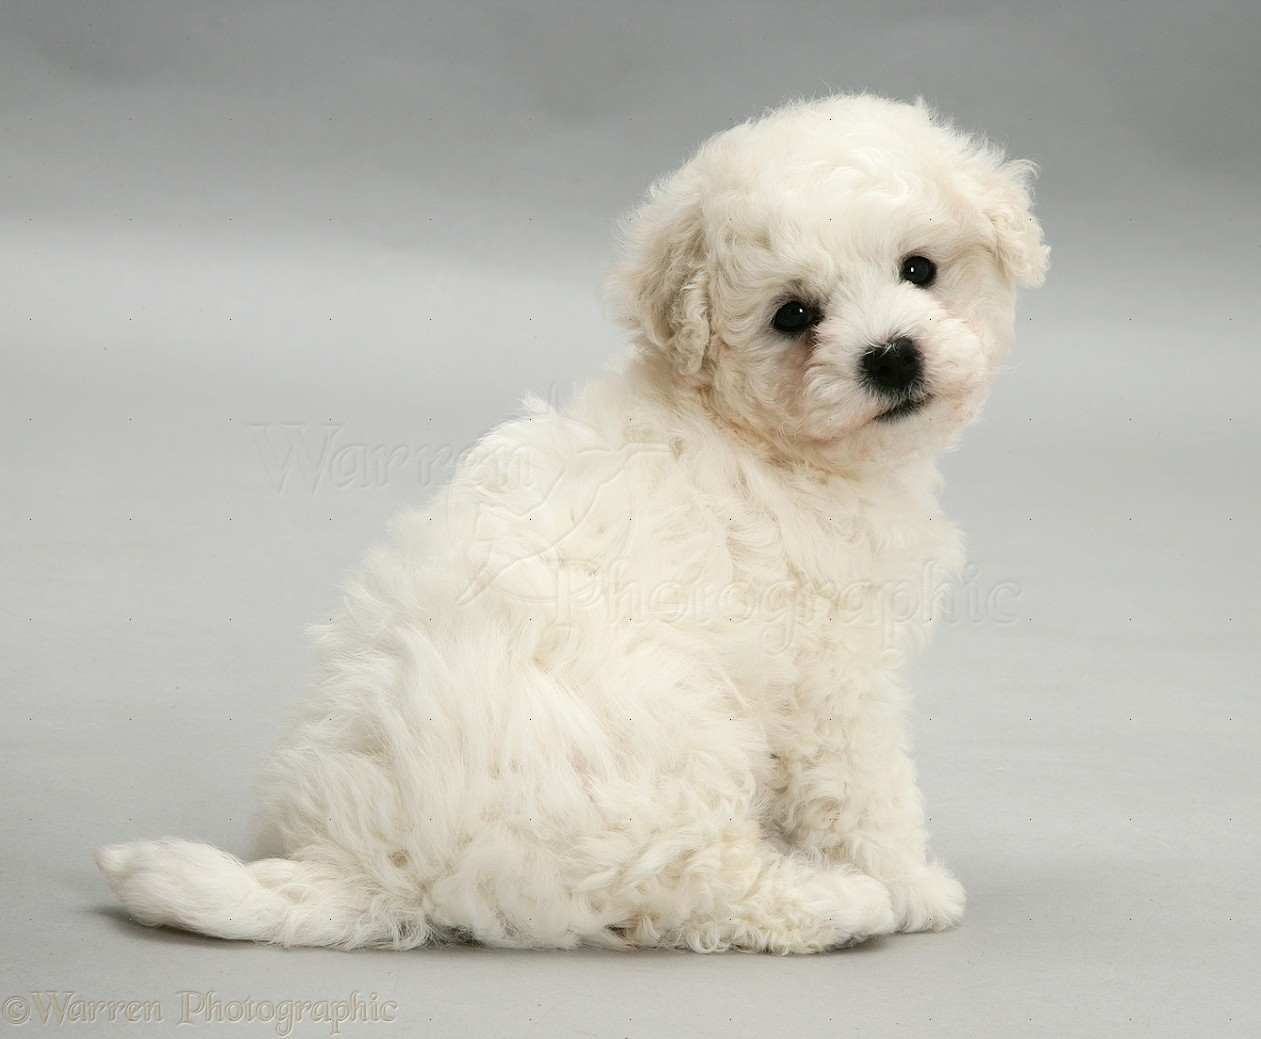 Puppy Bichon Frise Cute bichon frise puppy on